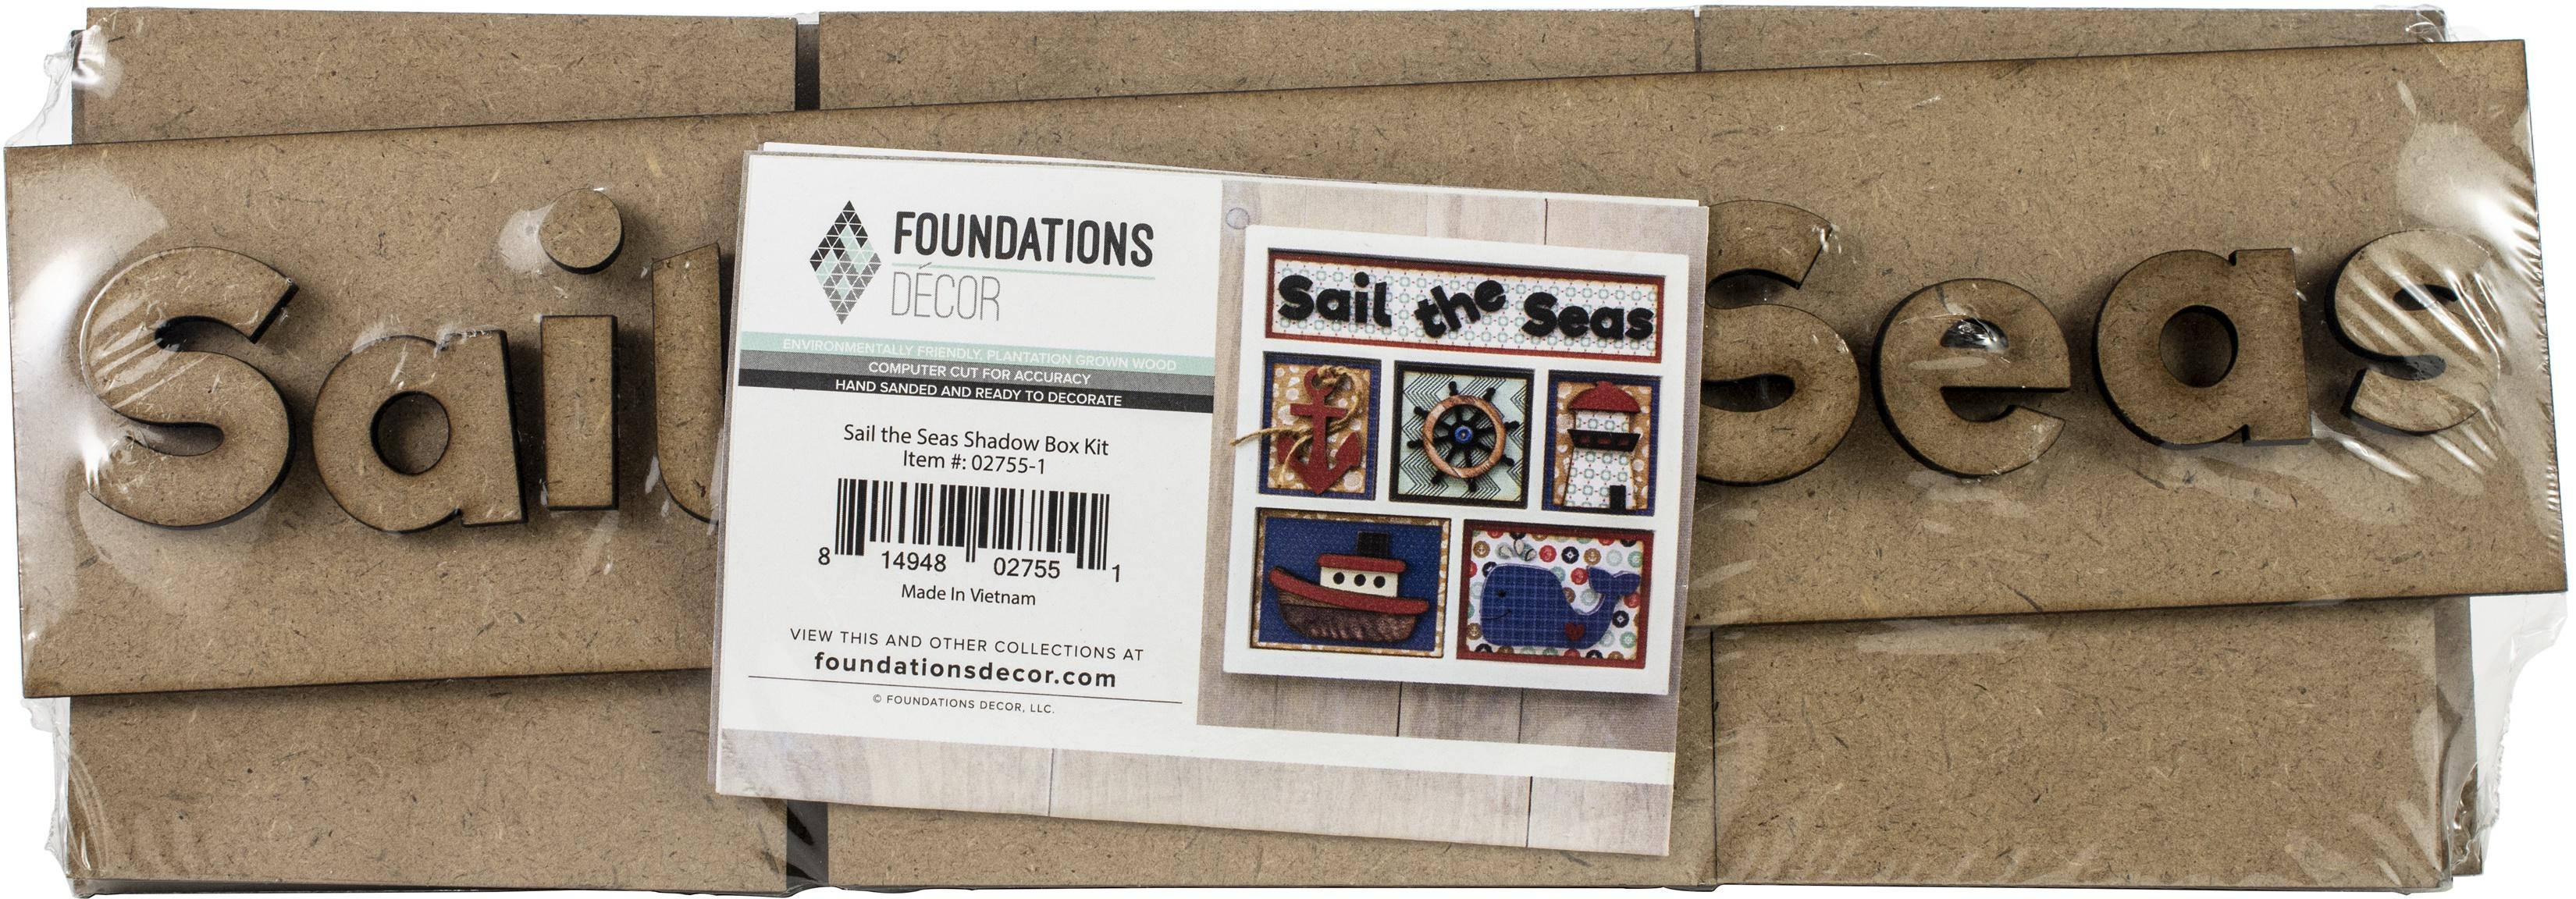 Sail The Seas Shadow Box kit